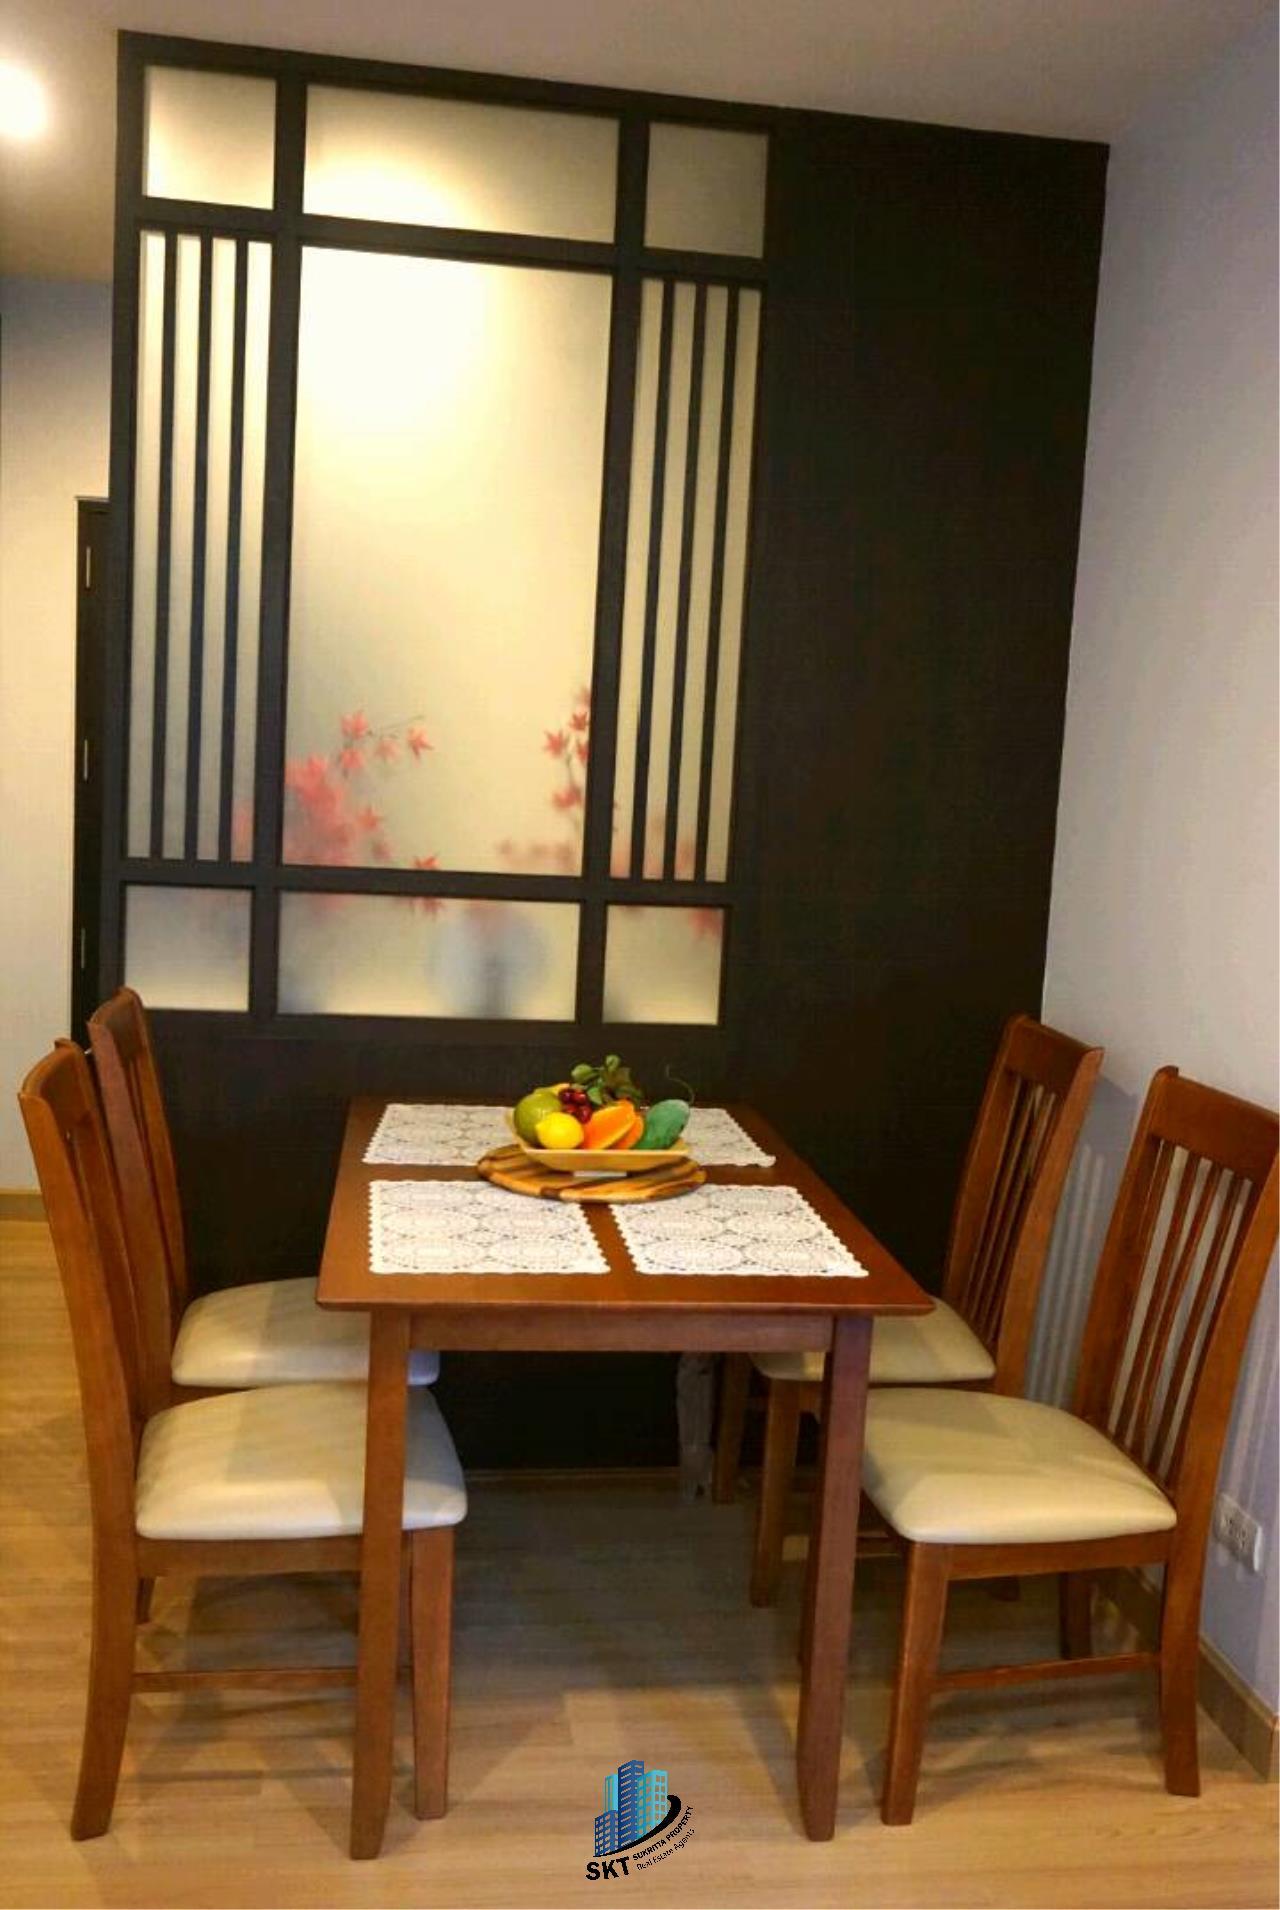 Sukritta Property Agency's FOR RENT VISTA GARDEN NEAR BTS PHRAKANONG 7